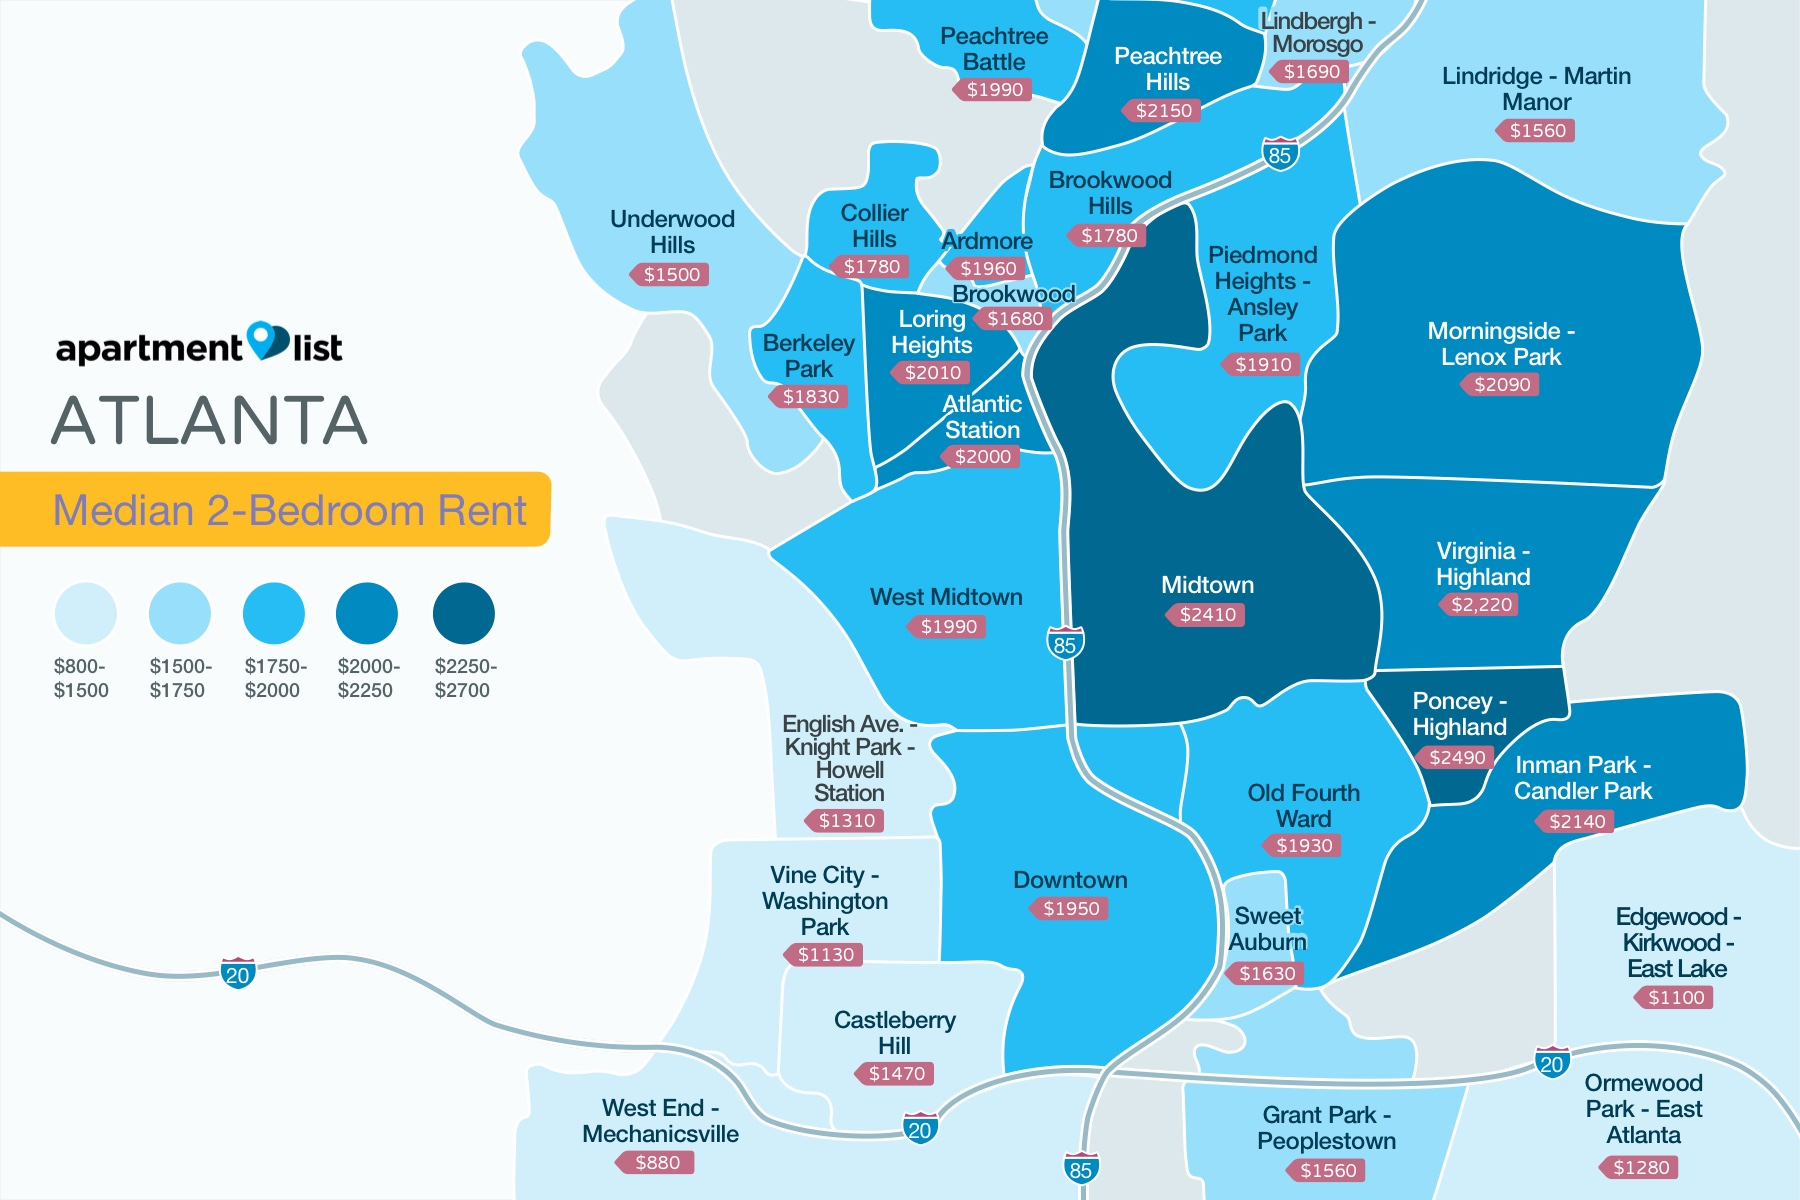 Atlanta Neighborhood Price Map